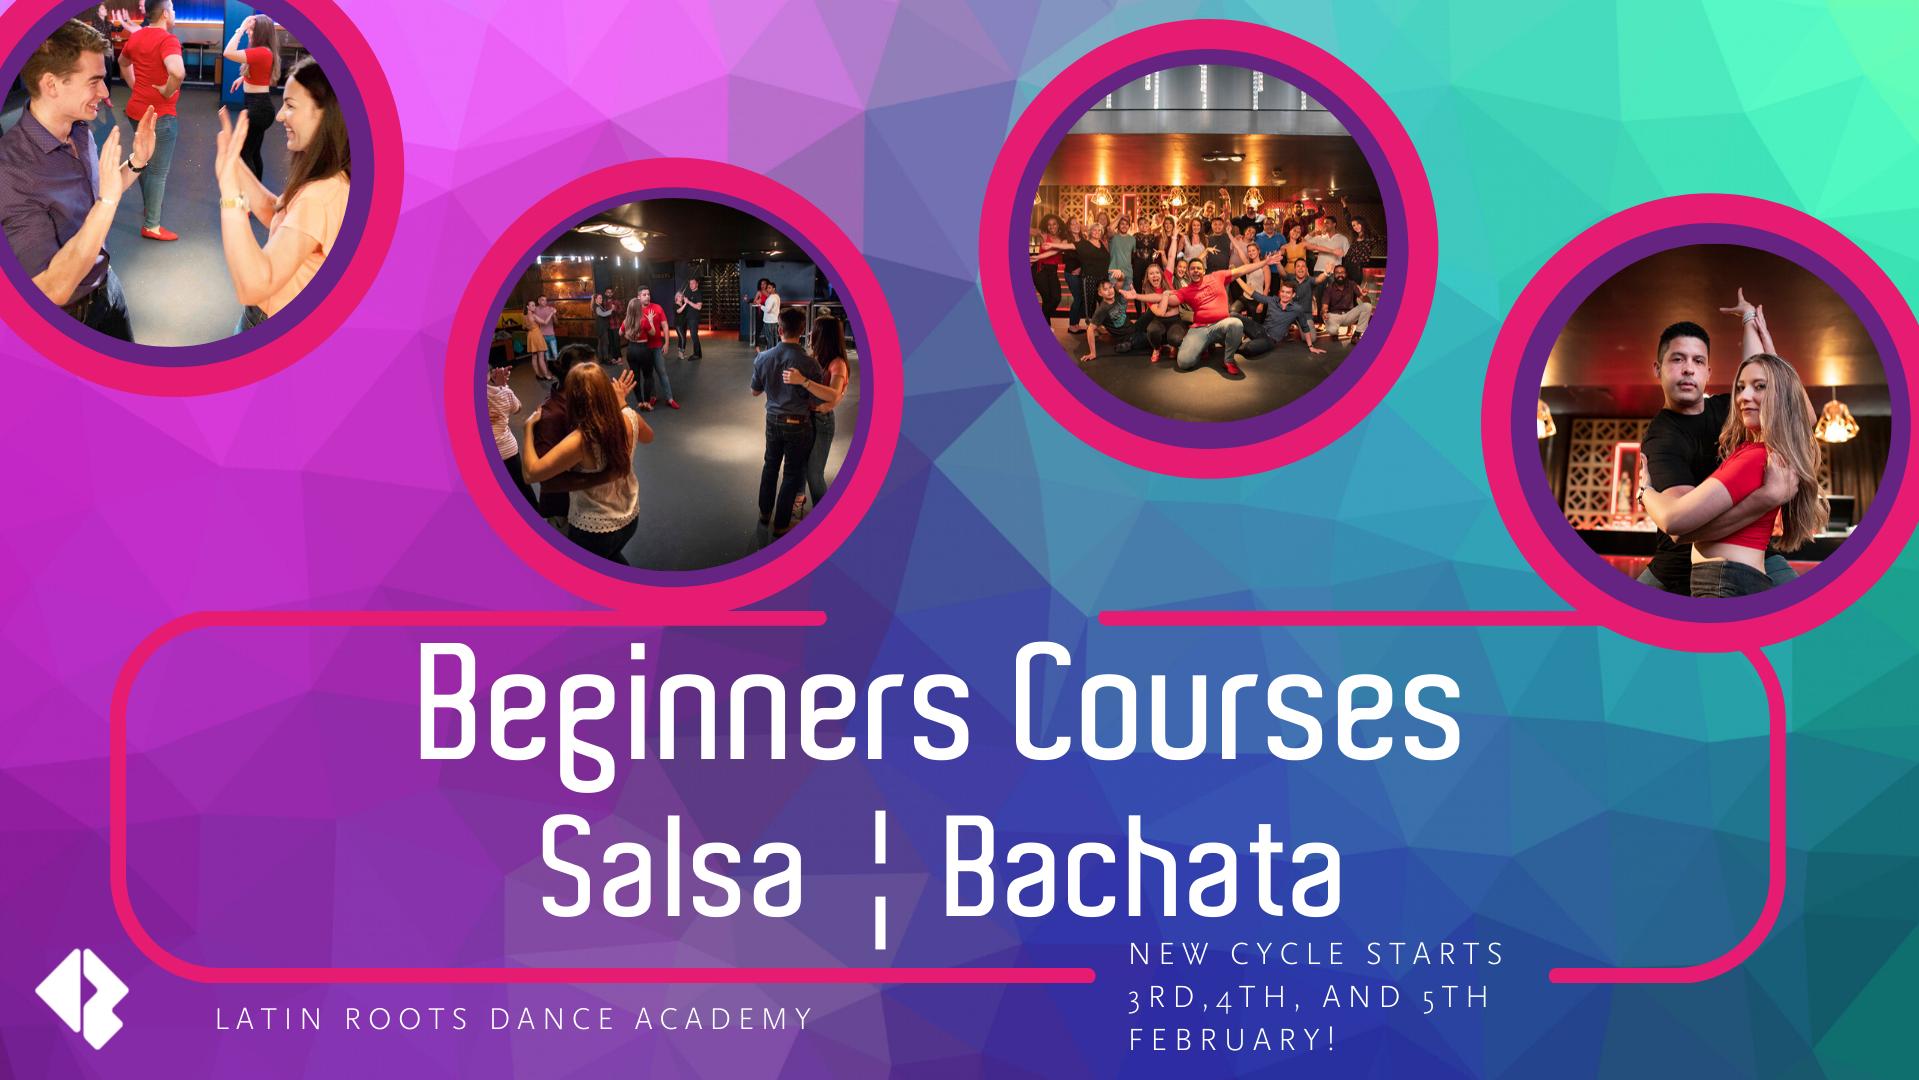 Latin Roots Edinburgh Bachata & Salsa You're Invited Join us